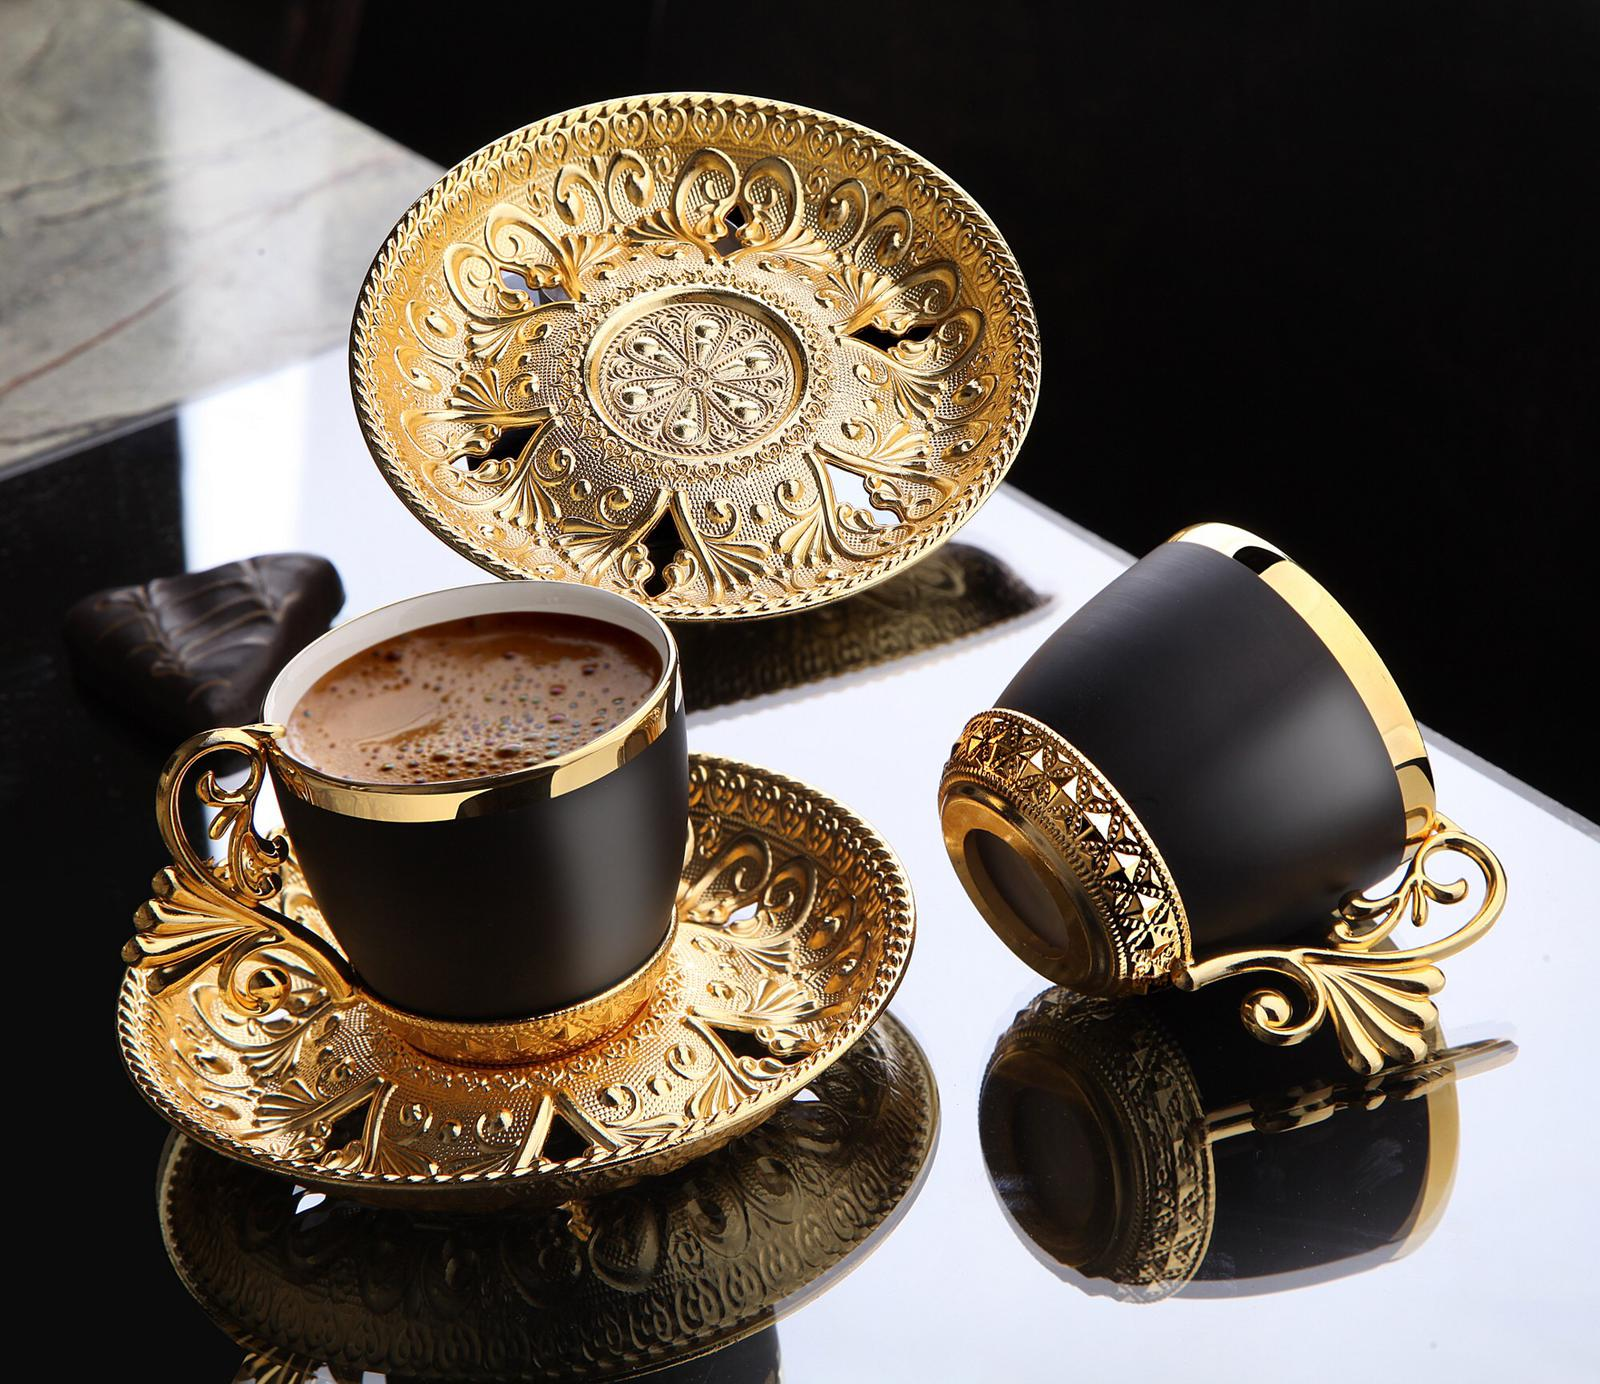 12 Pieces Turkish Coffee Cups Espresso Porcelain  Demitasse Cup Saucer Black Cups (Gold) Vintage Arabic Gift Set